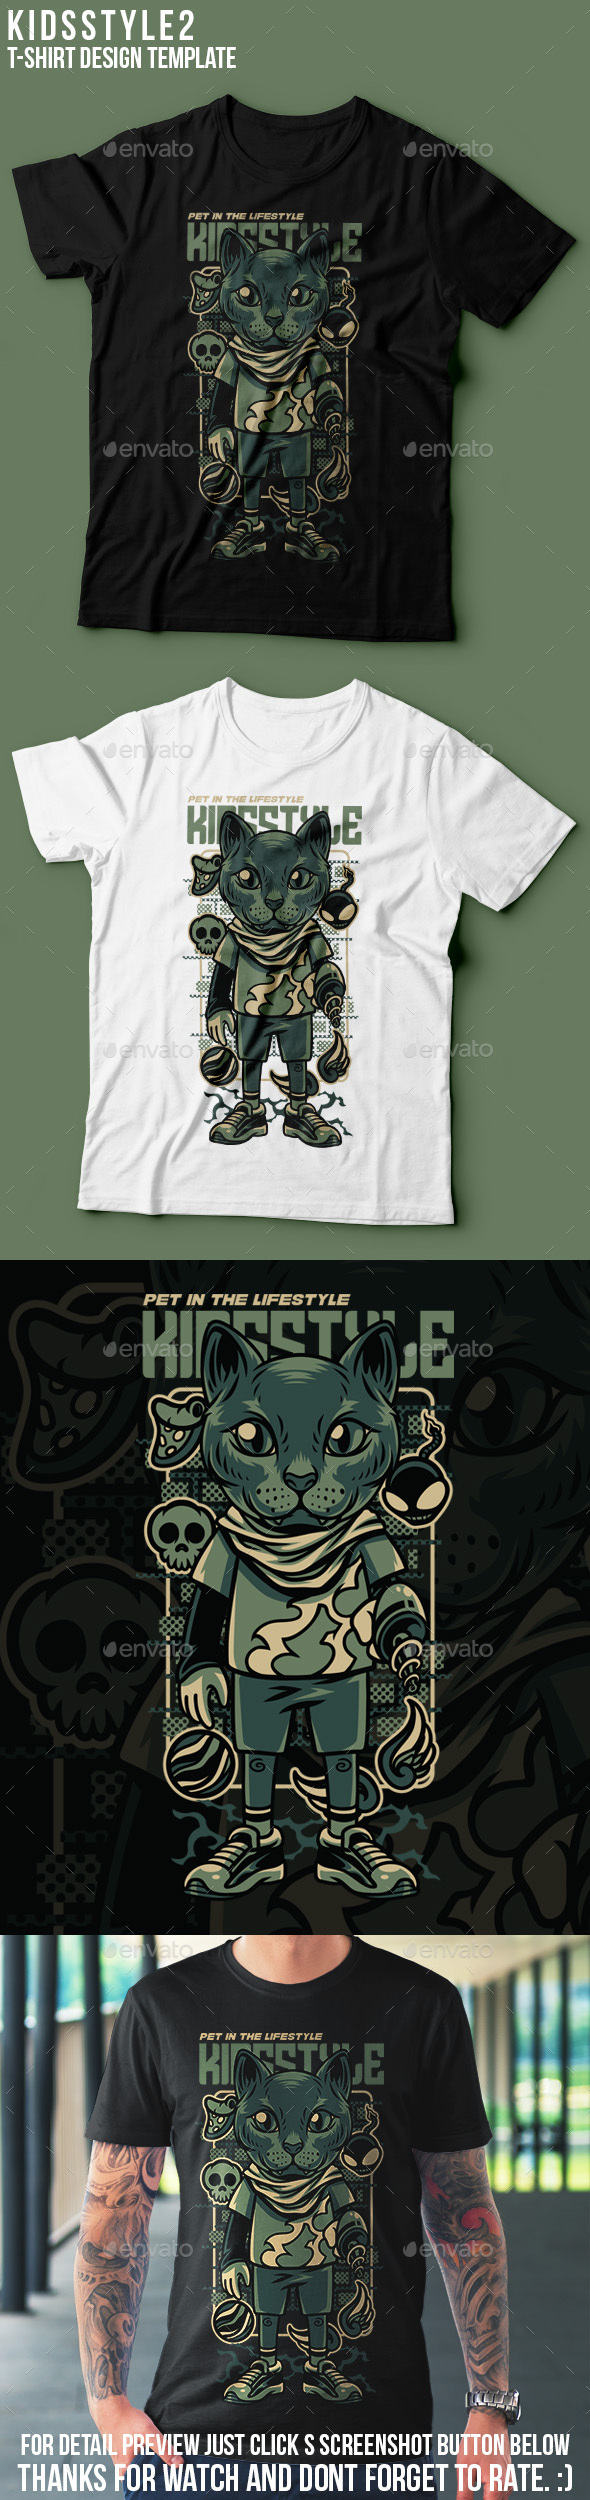 KIds Style 2 T-Shirt Design